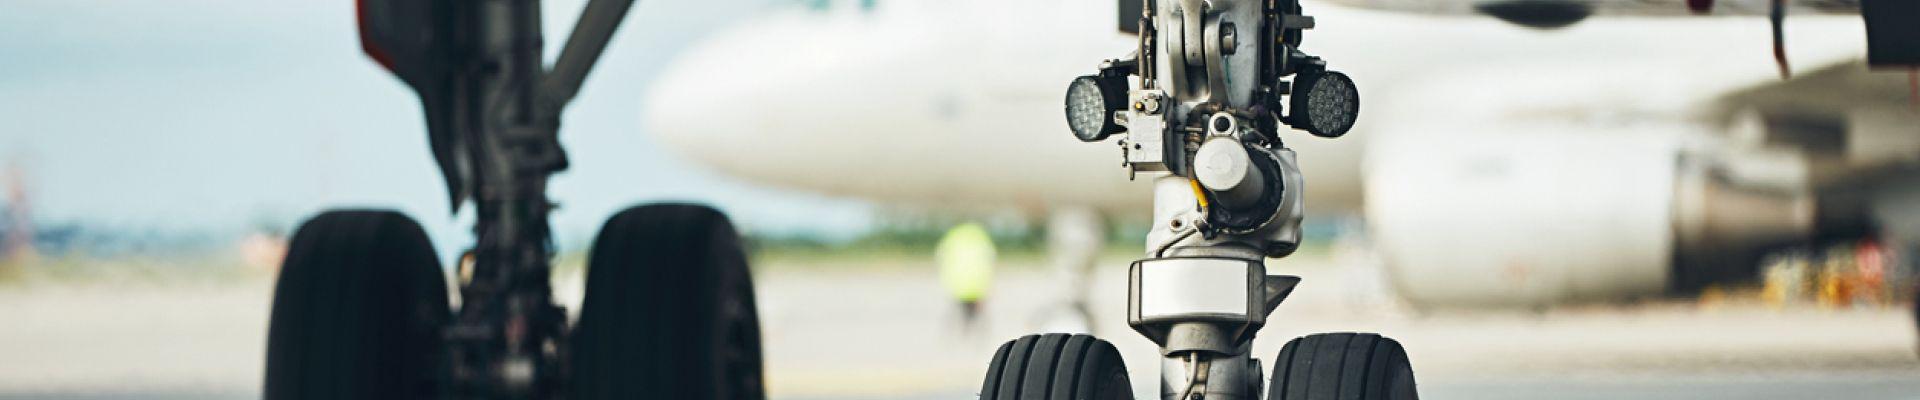 Aerospace mechanical performance parts